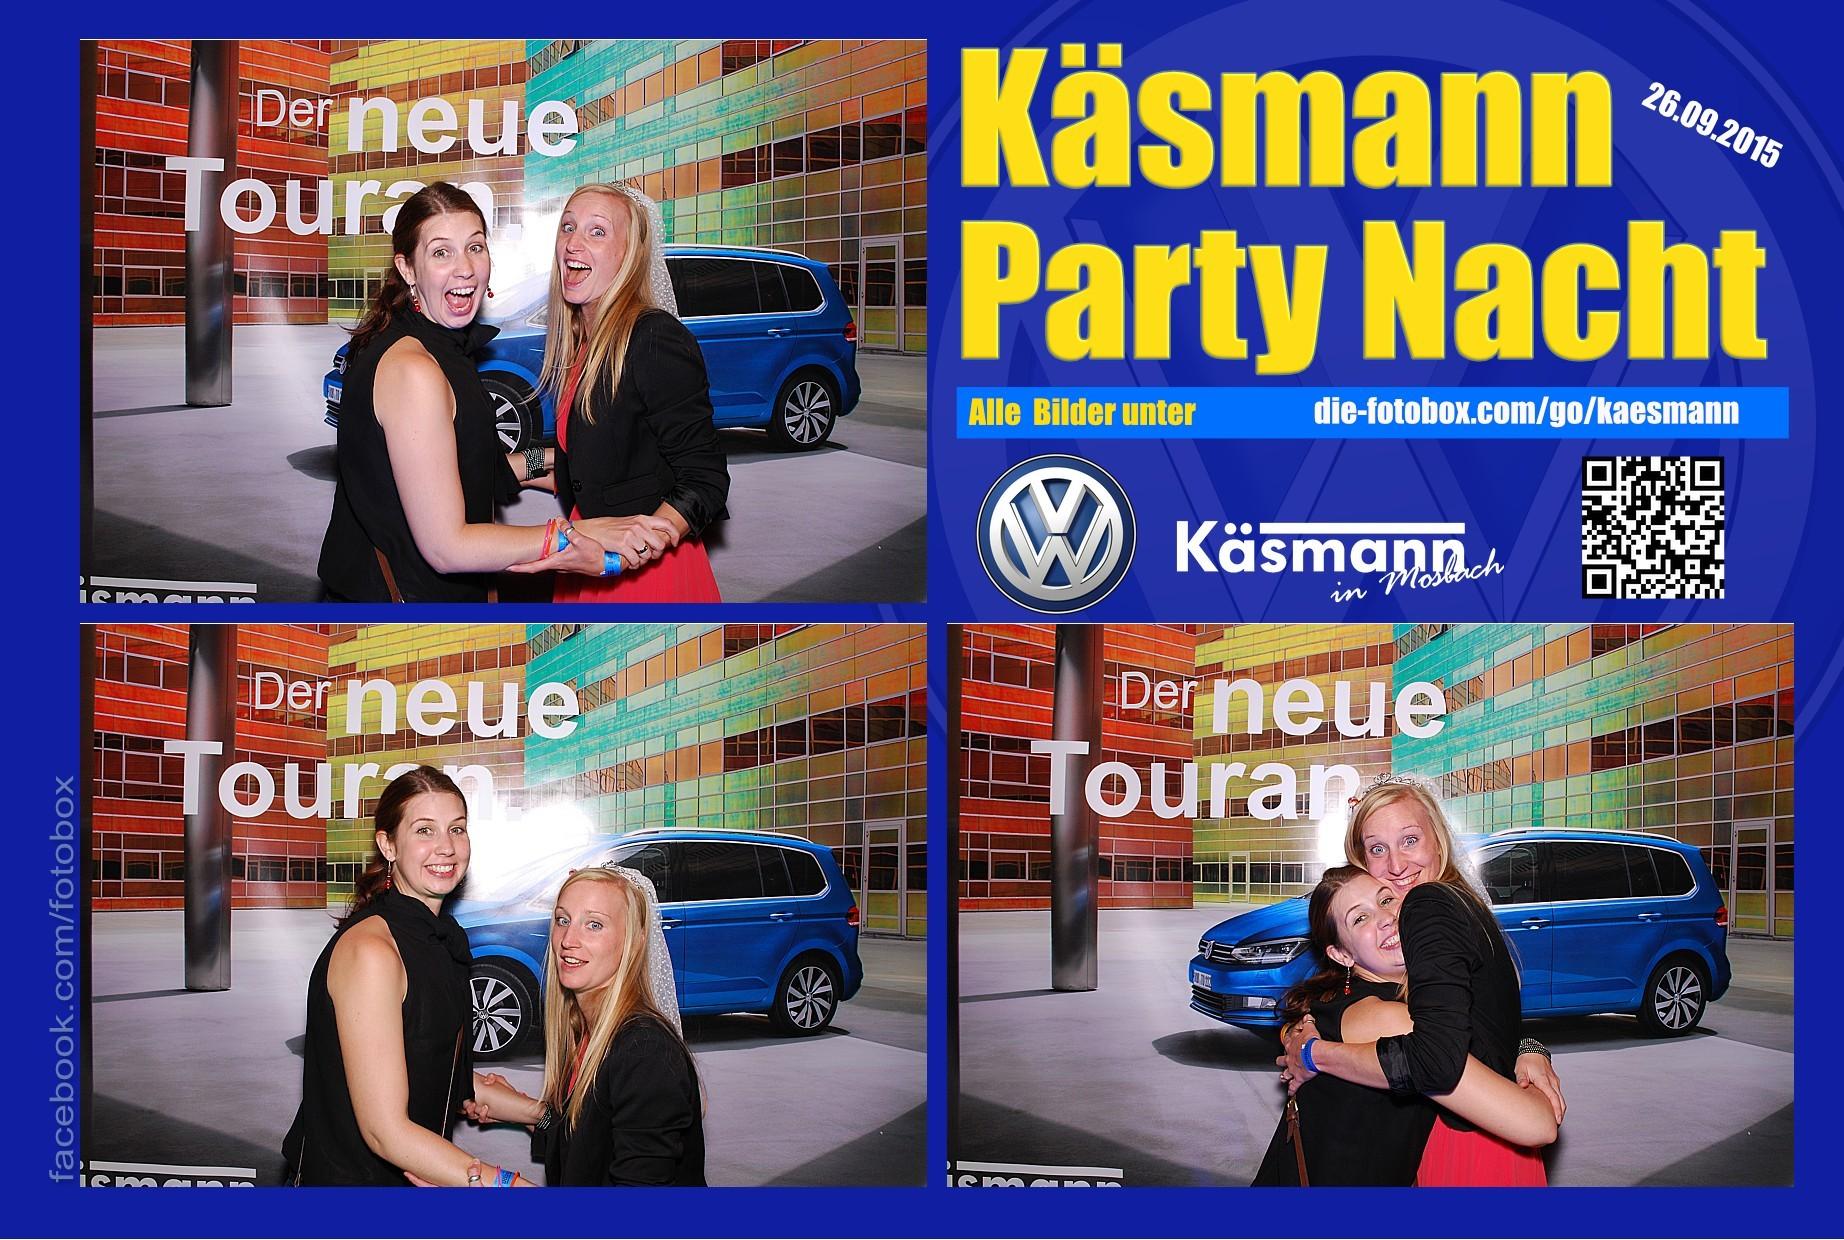 Käsmannparty 2015 - www.die-fotobox.com 01020